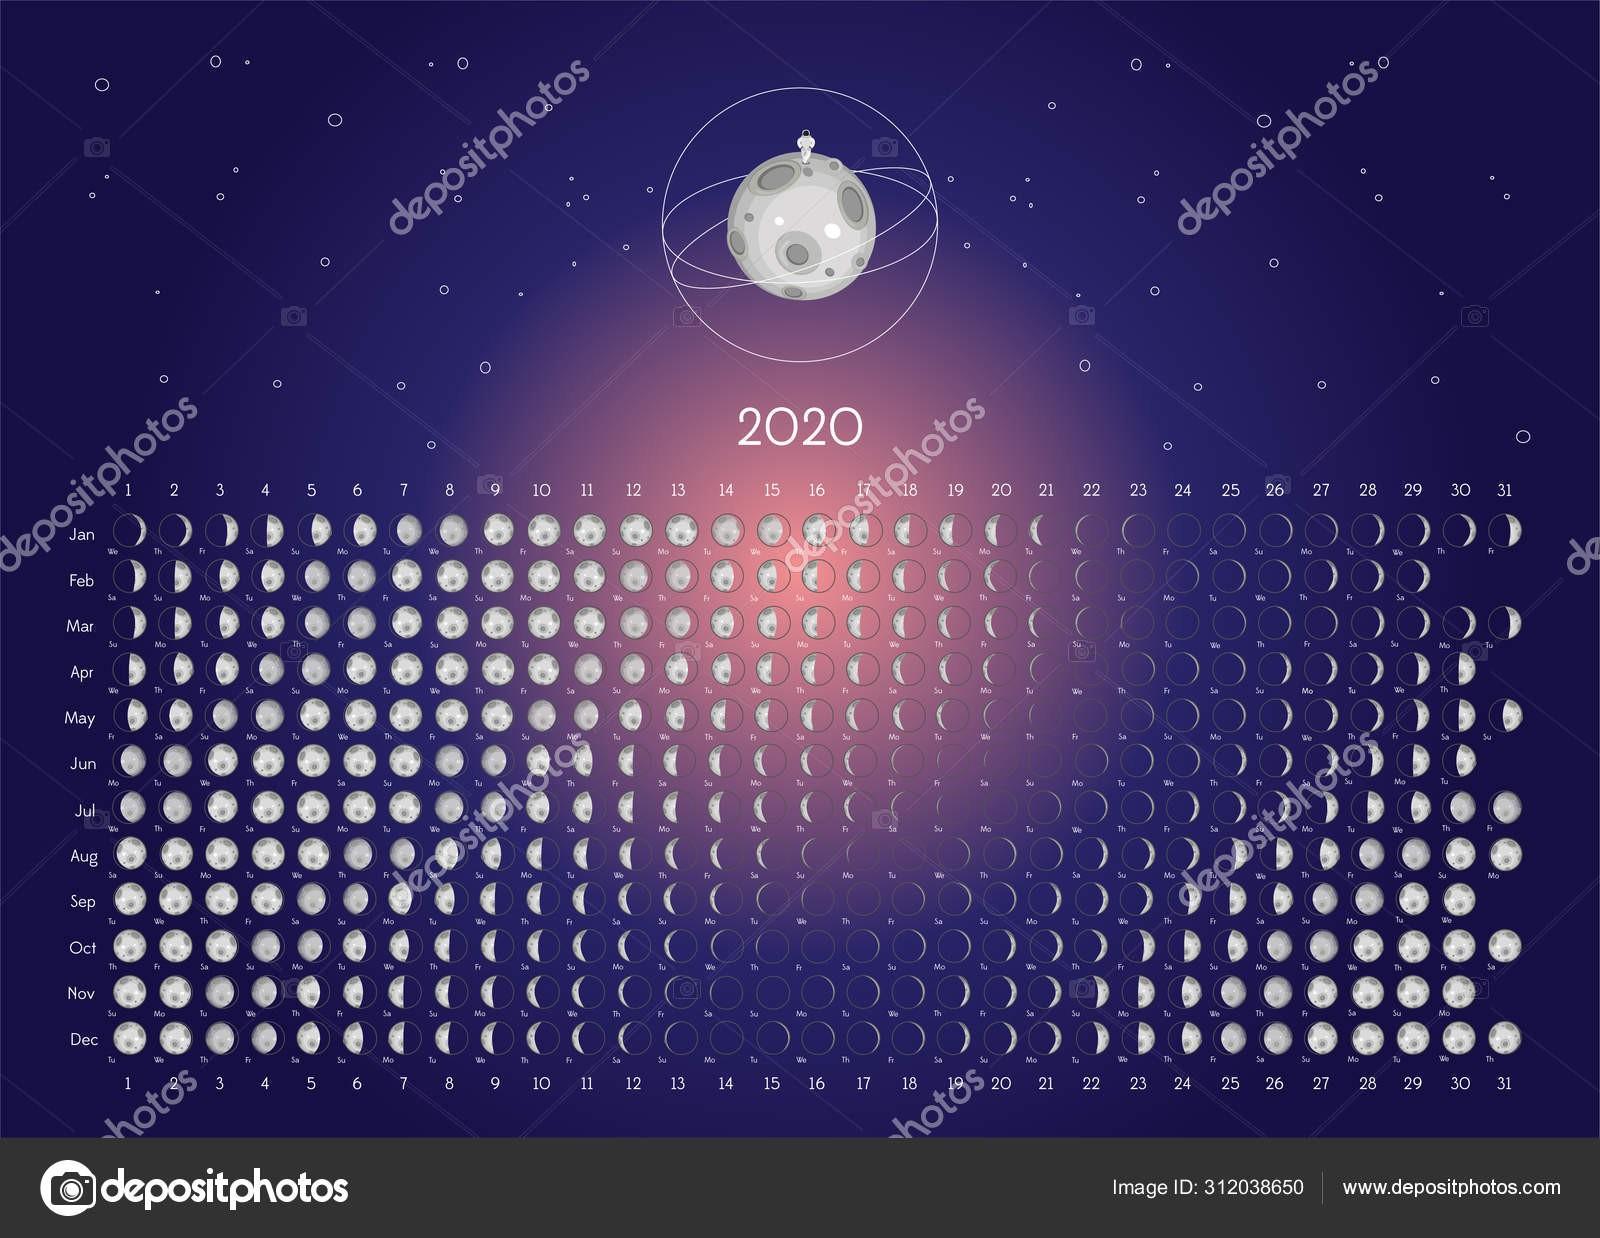 depositphotos stock illustration moon calendar 2020 northern hemisphere